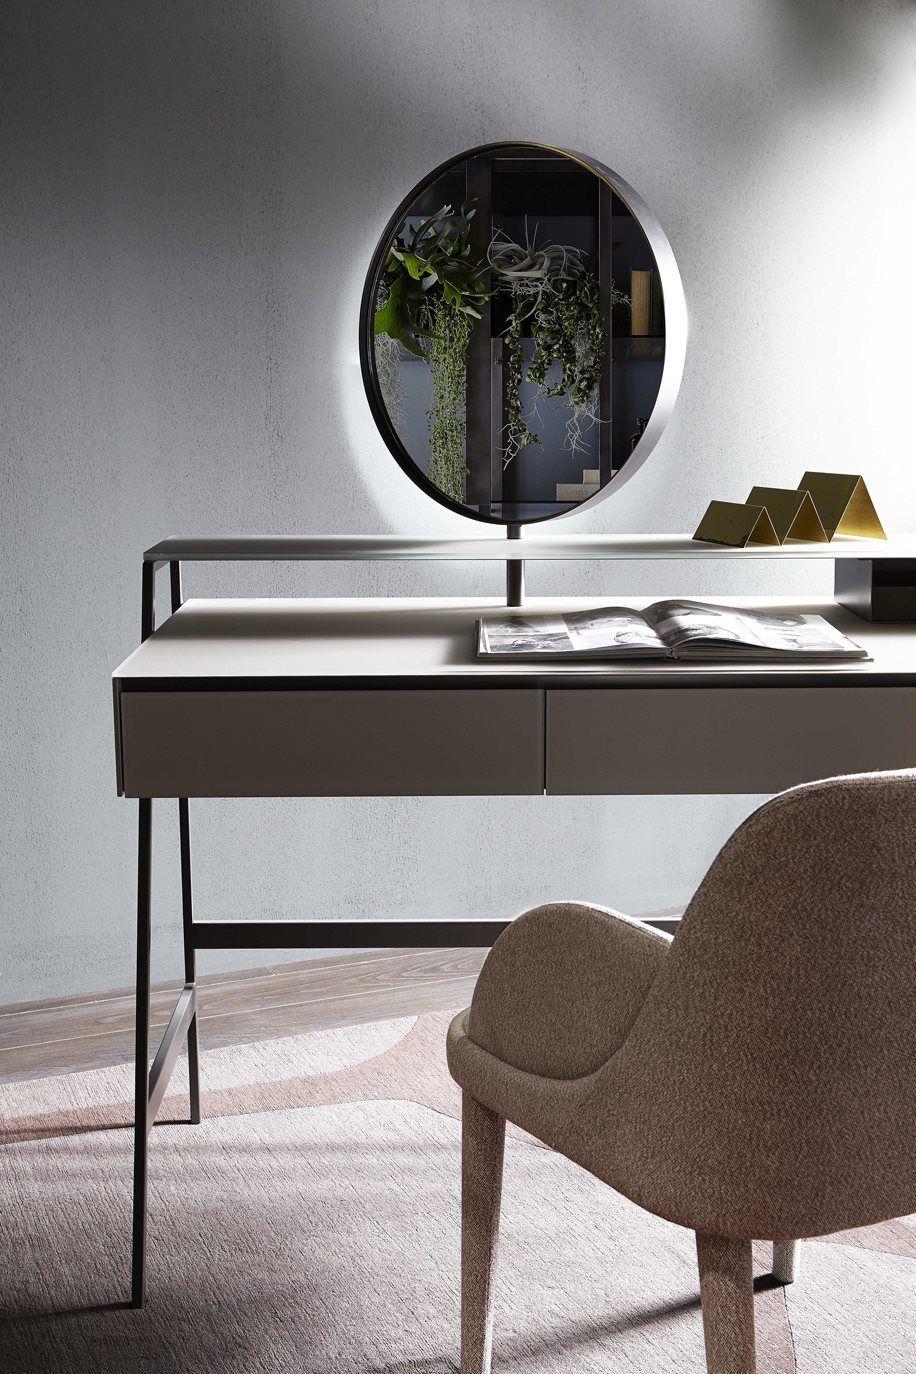 Pin de IRENE LIAO en Furniture。Gallotti&Radice | Pinterest